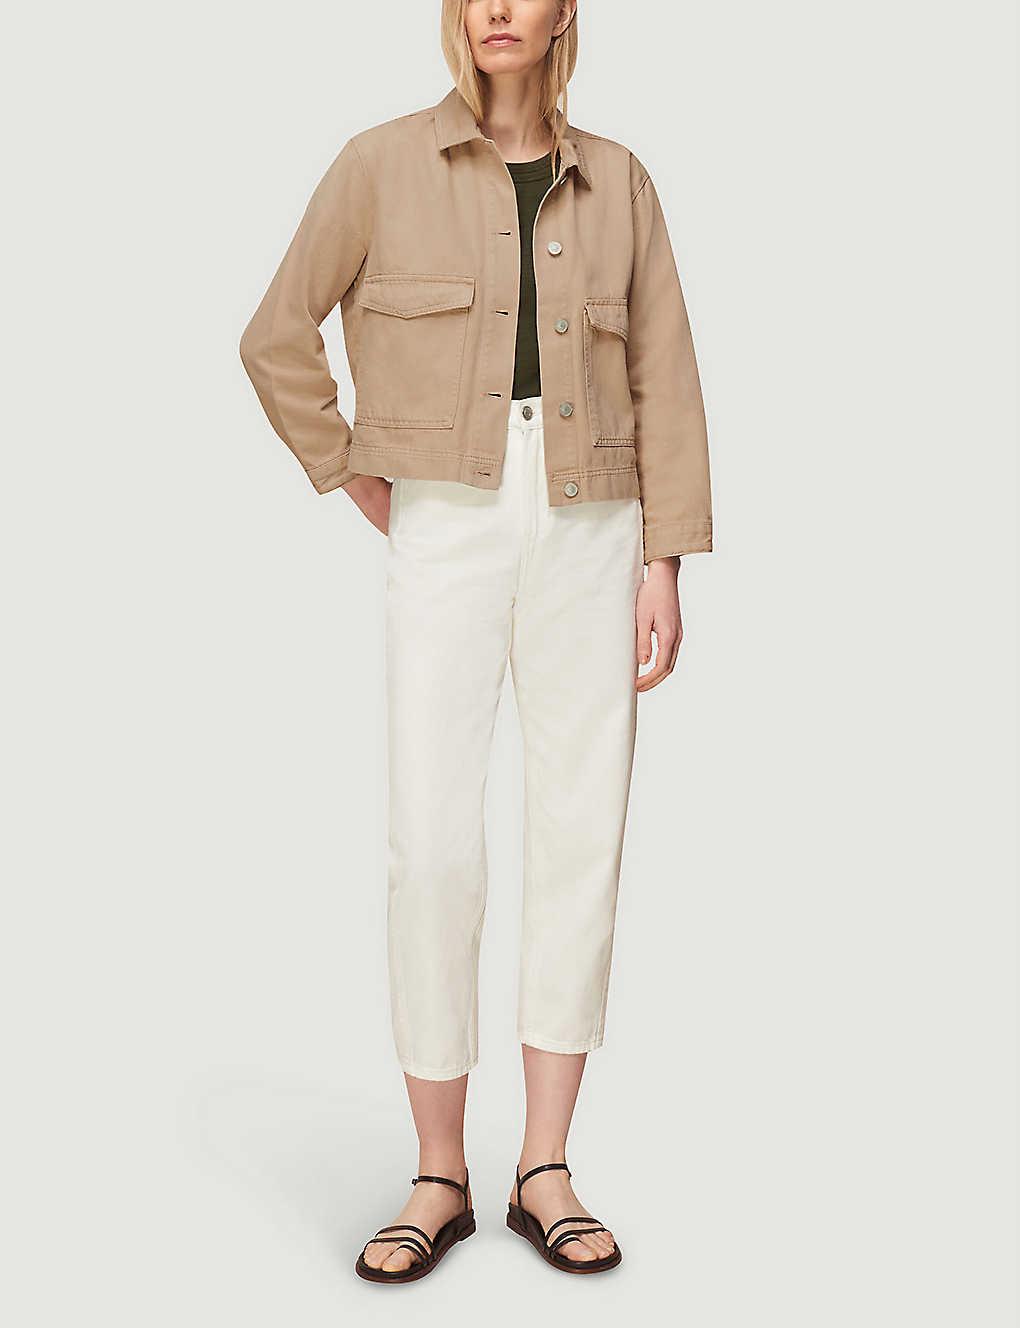 Boxy Tan Denim Jacket